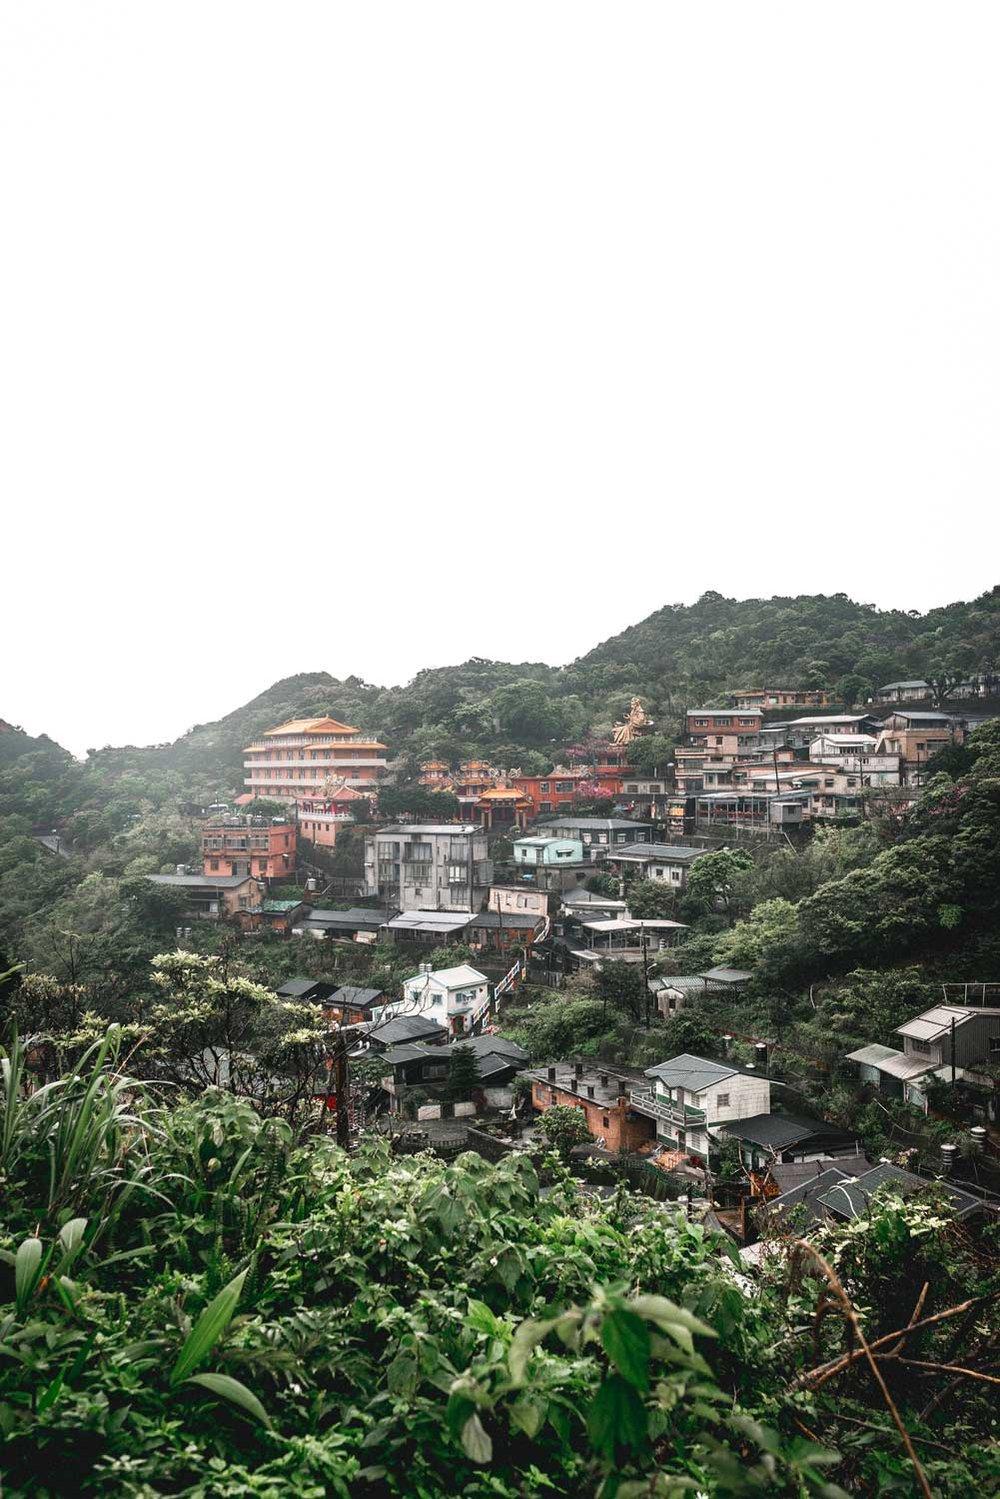 Jinguashi Village